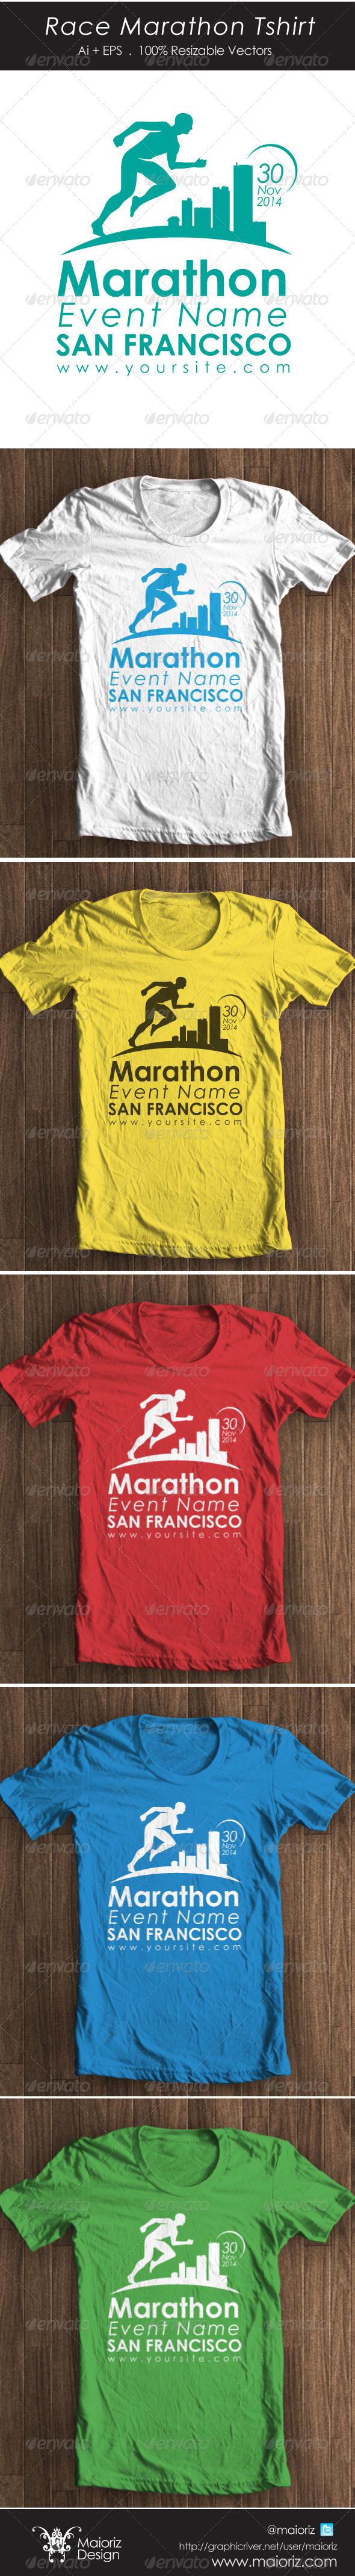 GraphicRiver Race Marathon Tshirt 4455791